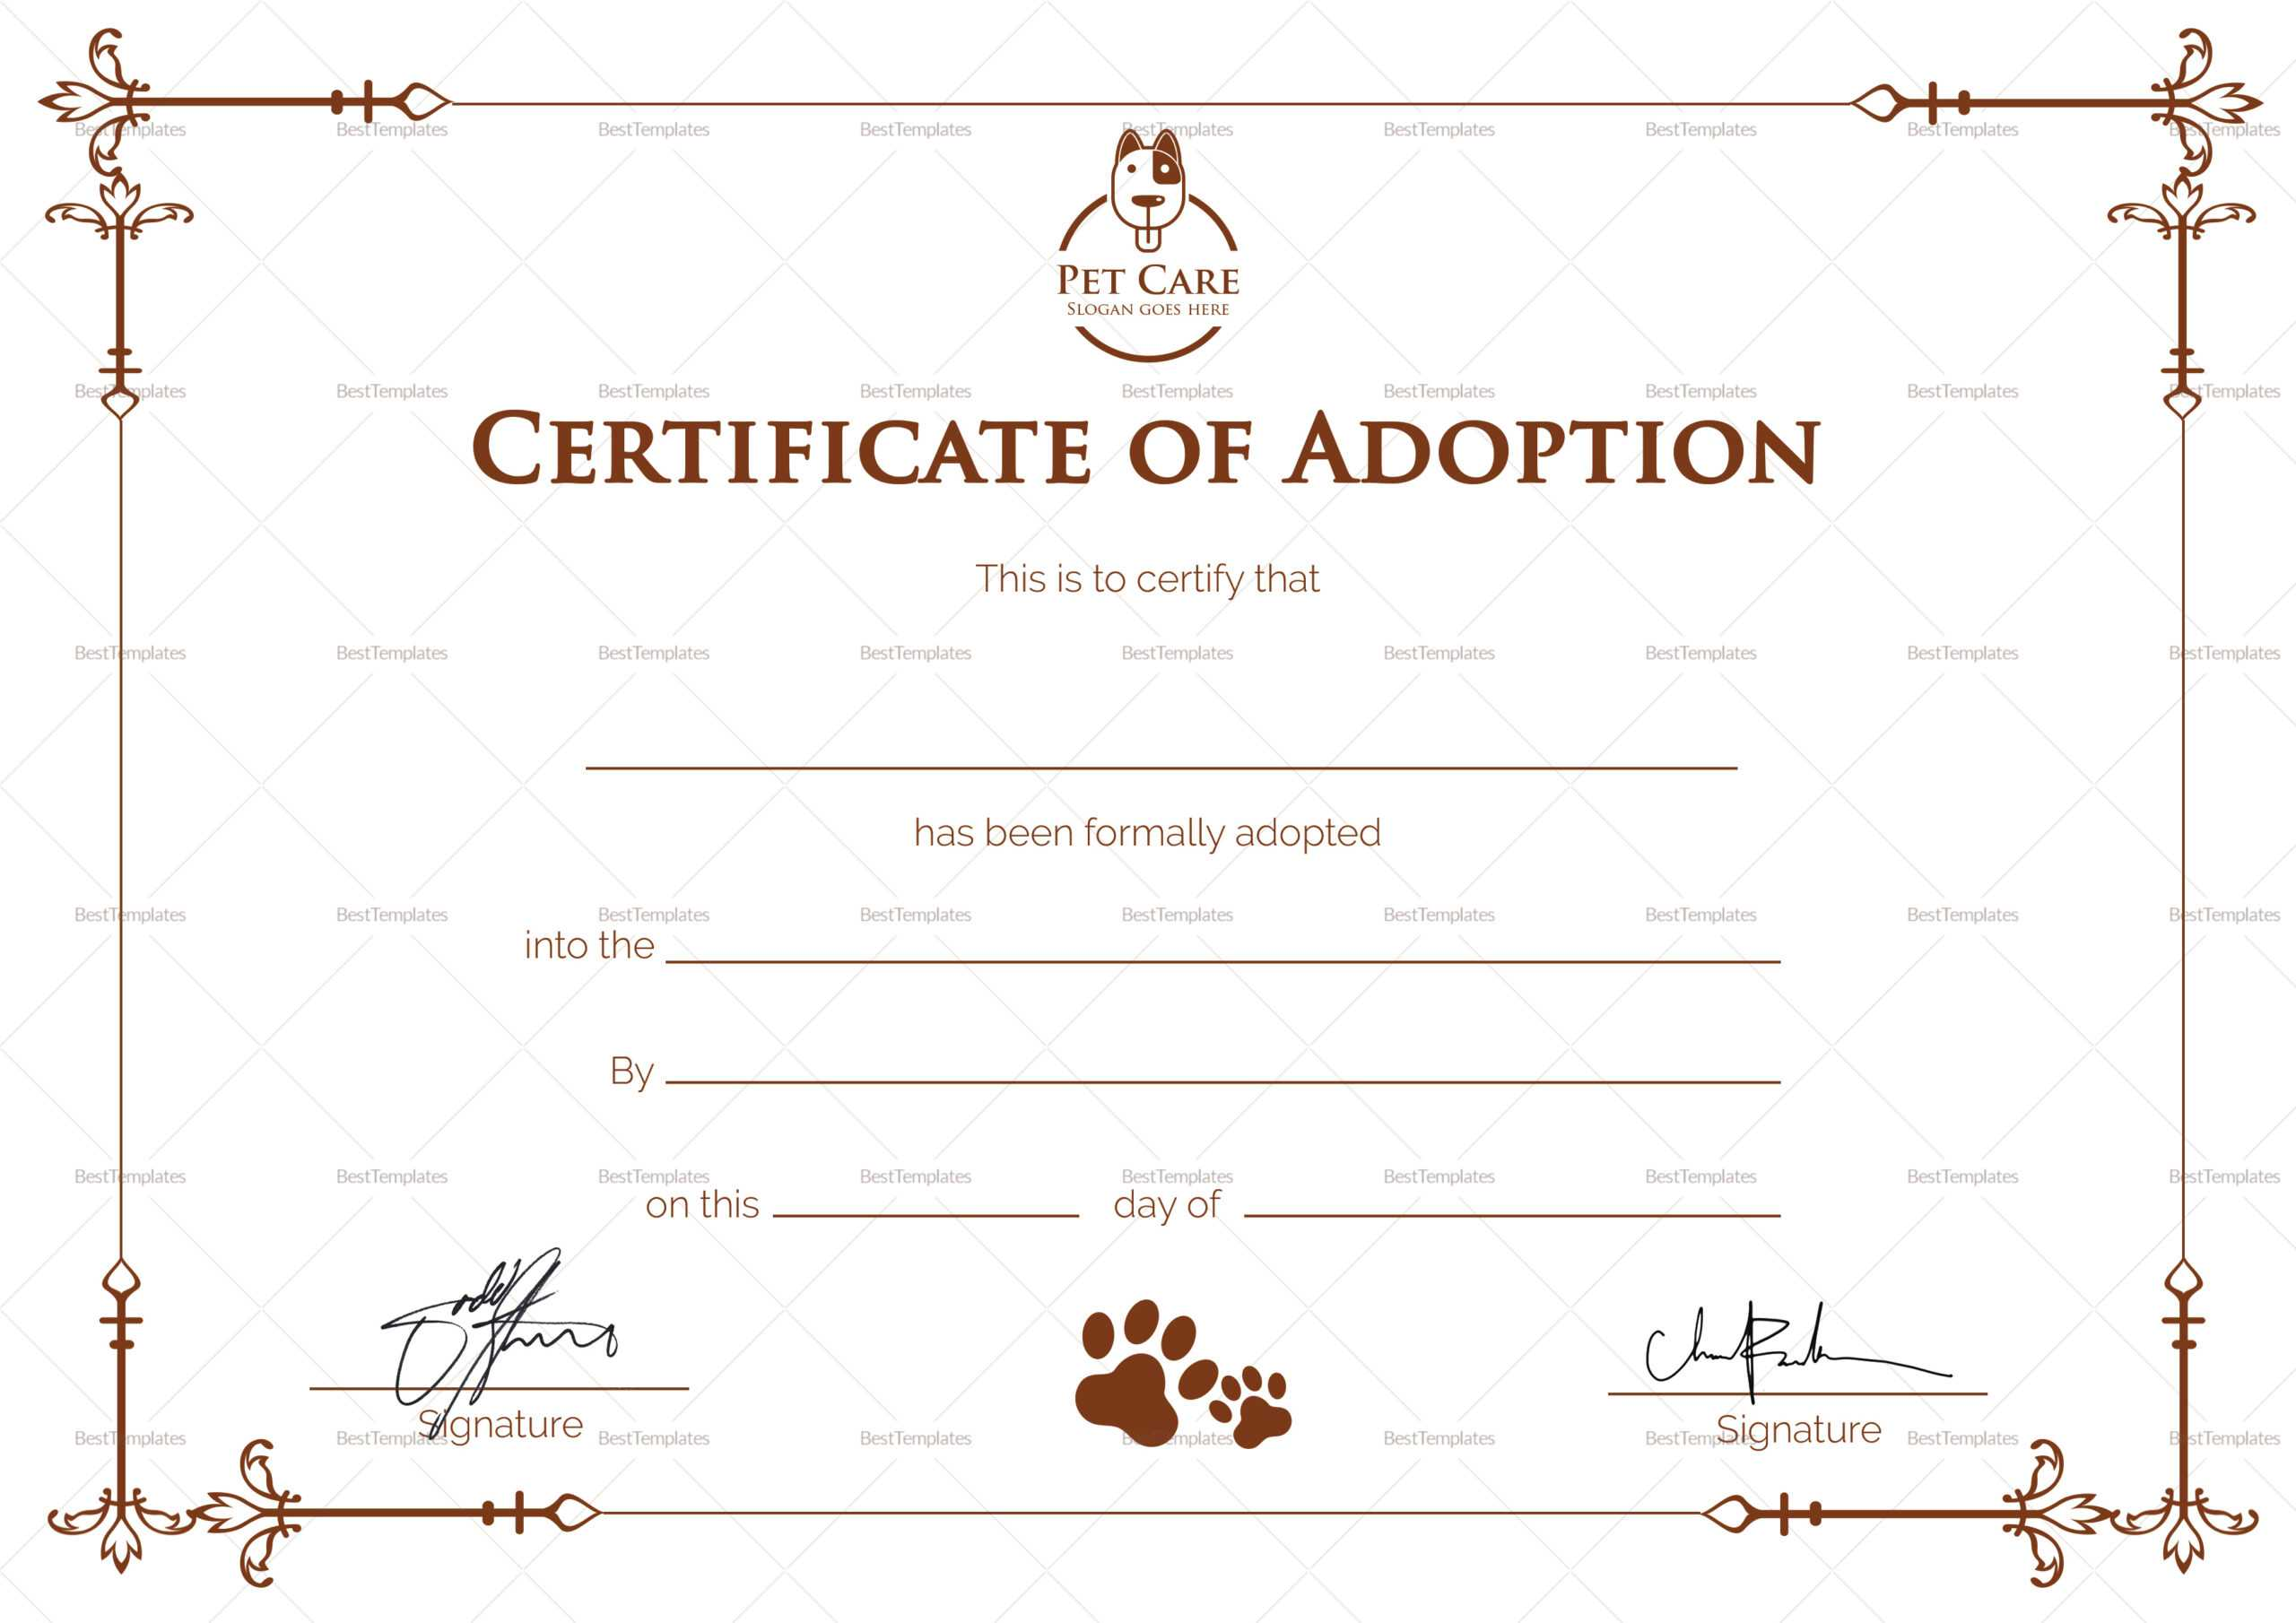 Certificate Of Adoption Template Inside Adoption Certificate Template